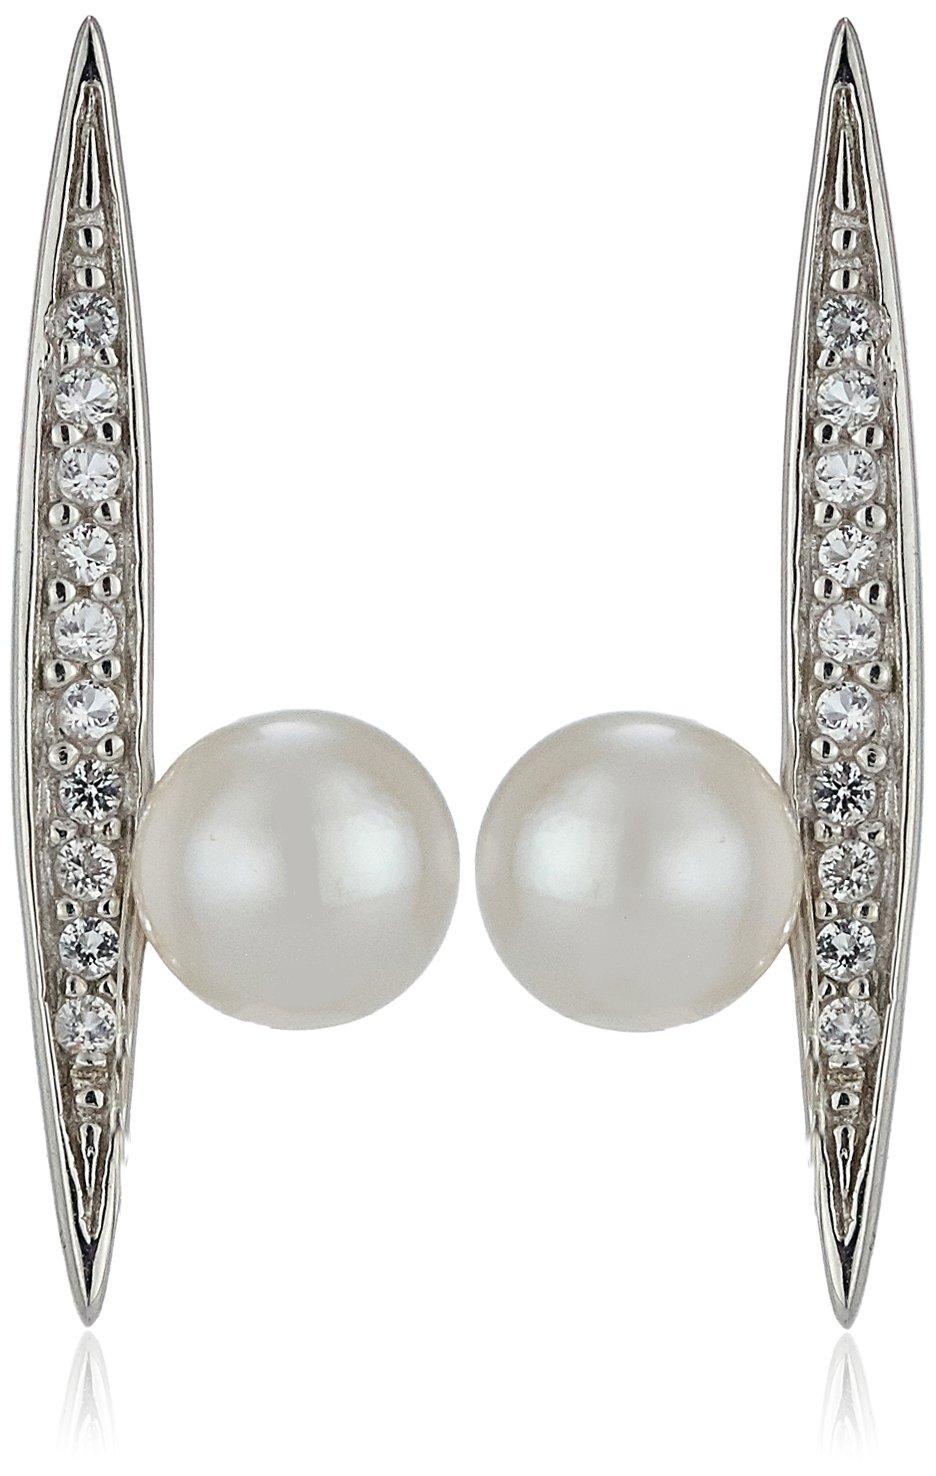 TARA Pearls 5X5.5mm Akoya Flying Pearl Sterling Silver Earrings with White Topaz Ear Cuffs